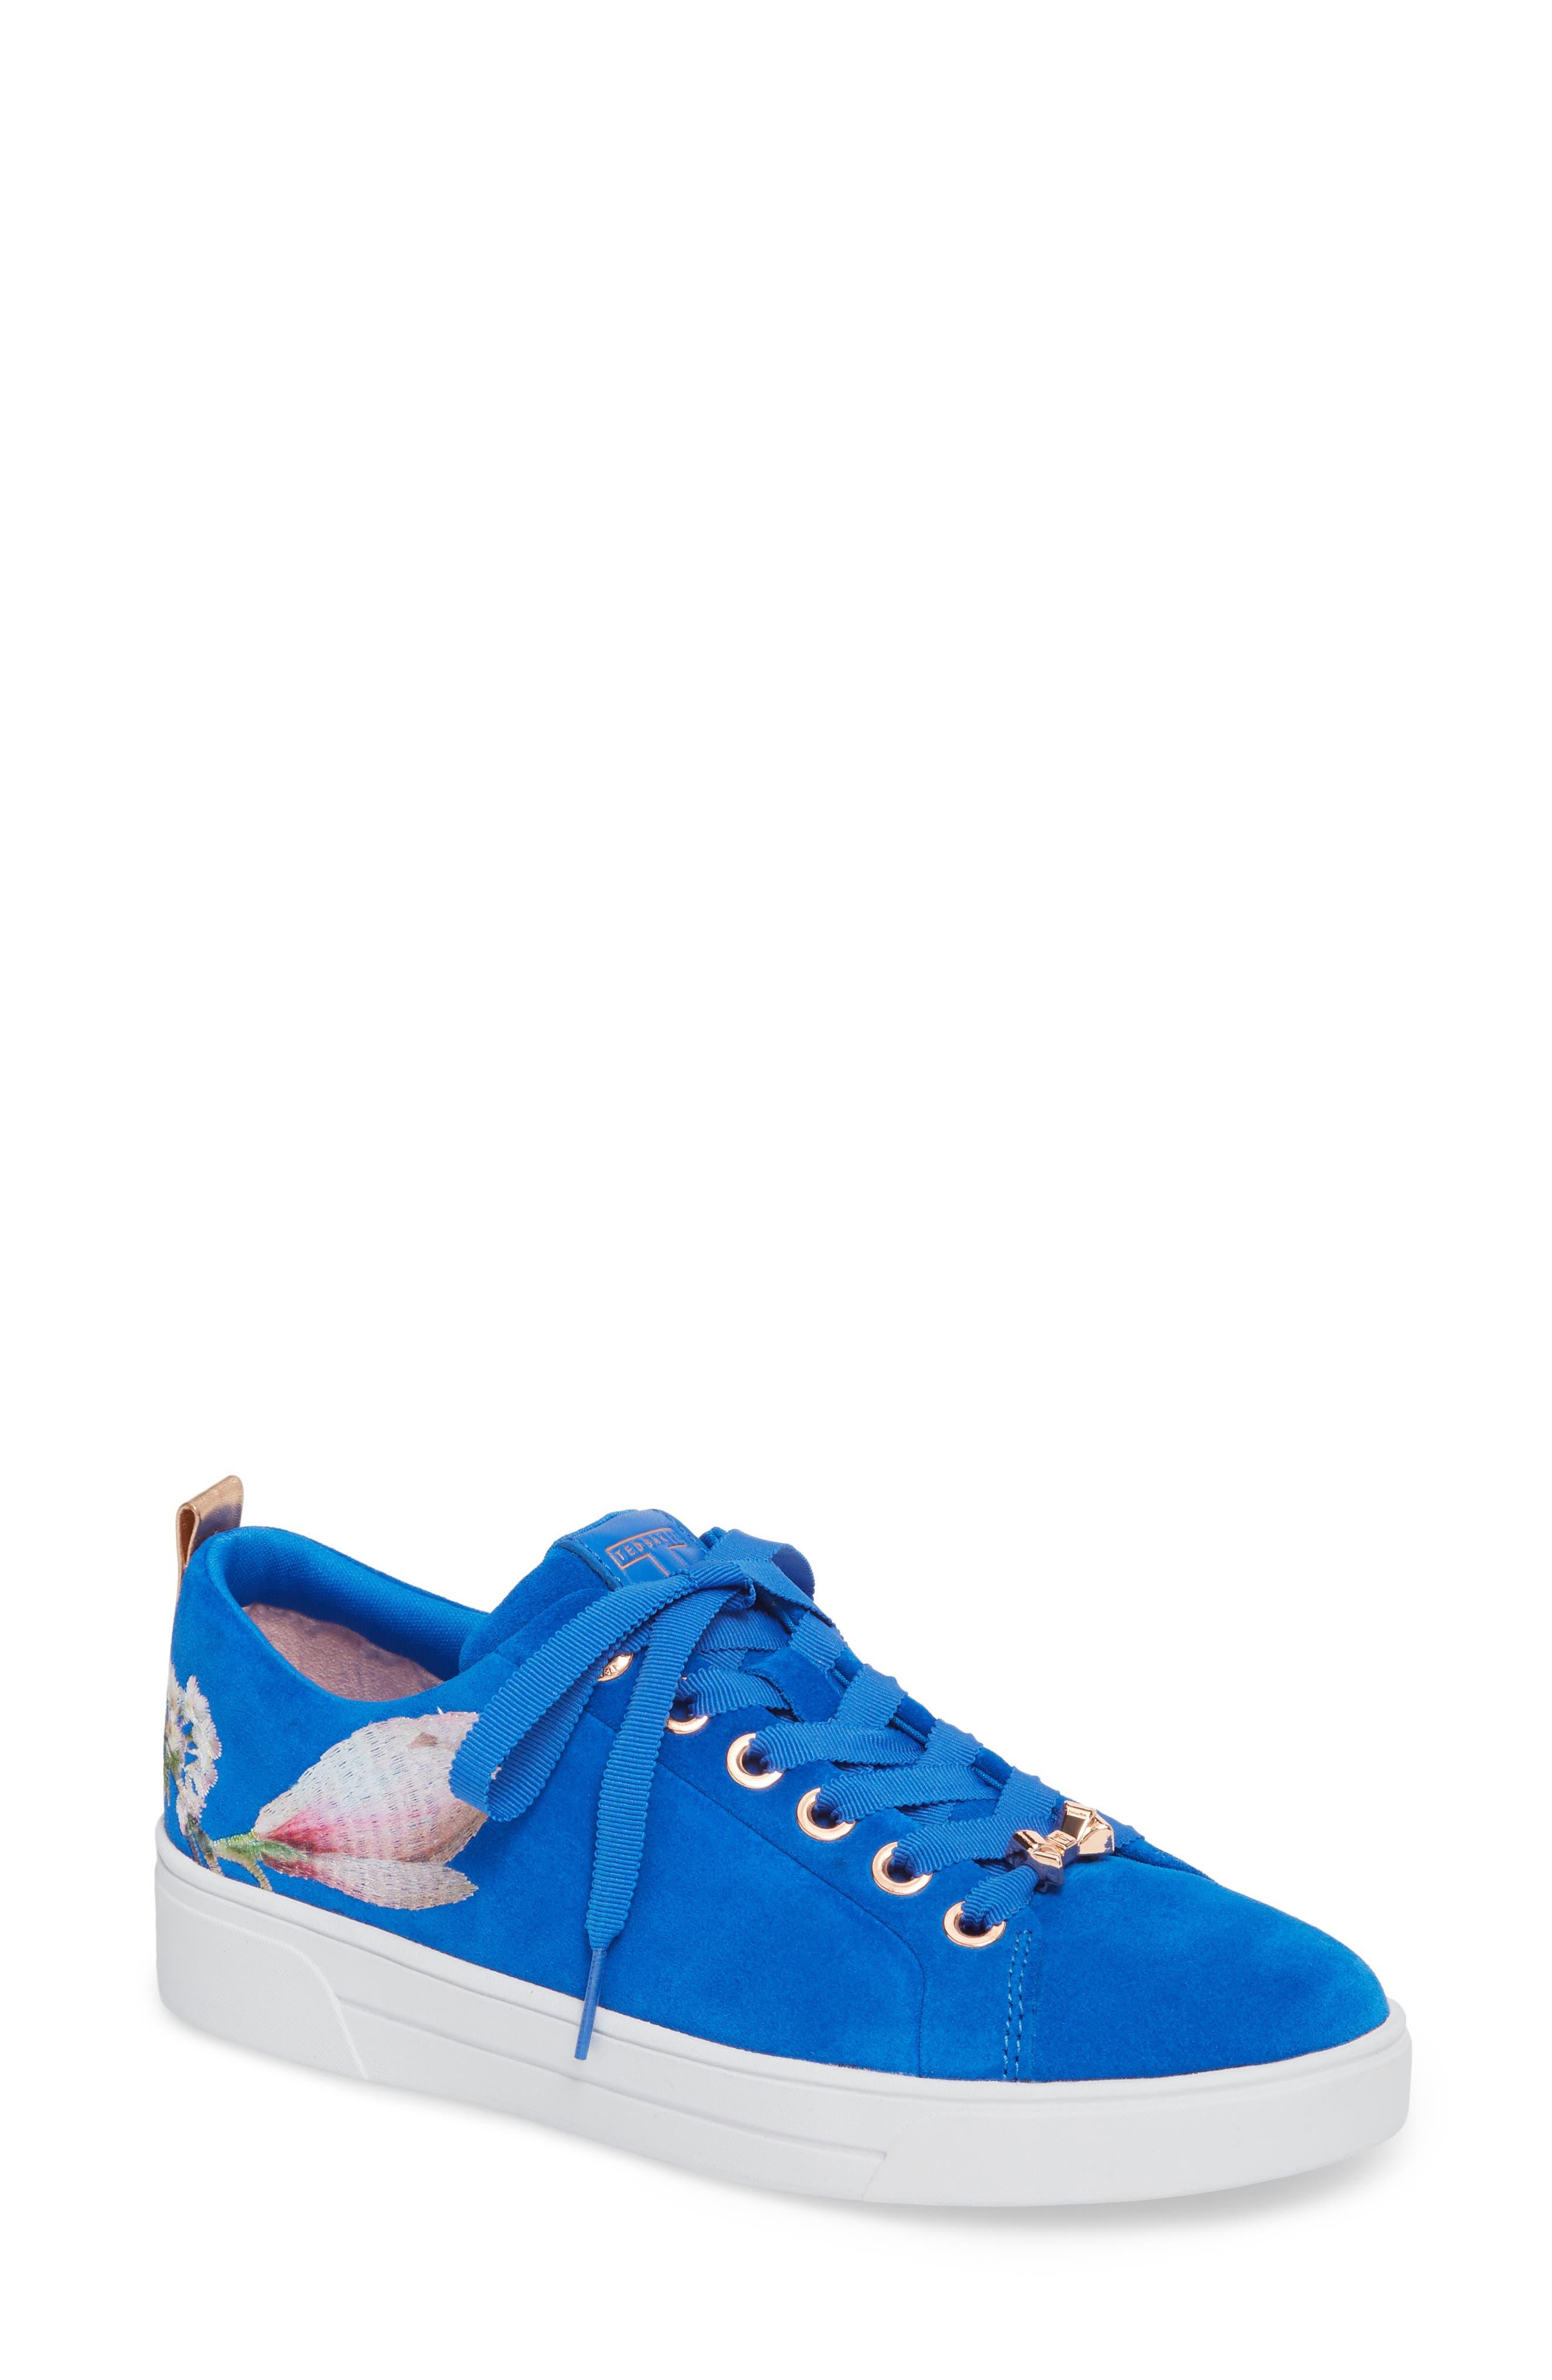 Eryin Sneaker,                             Main thumbnail 1, color,                             BLUE HARMONY PRINT SUEDE